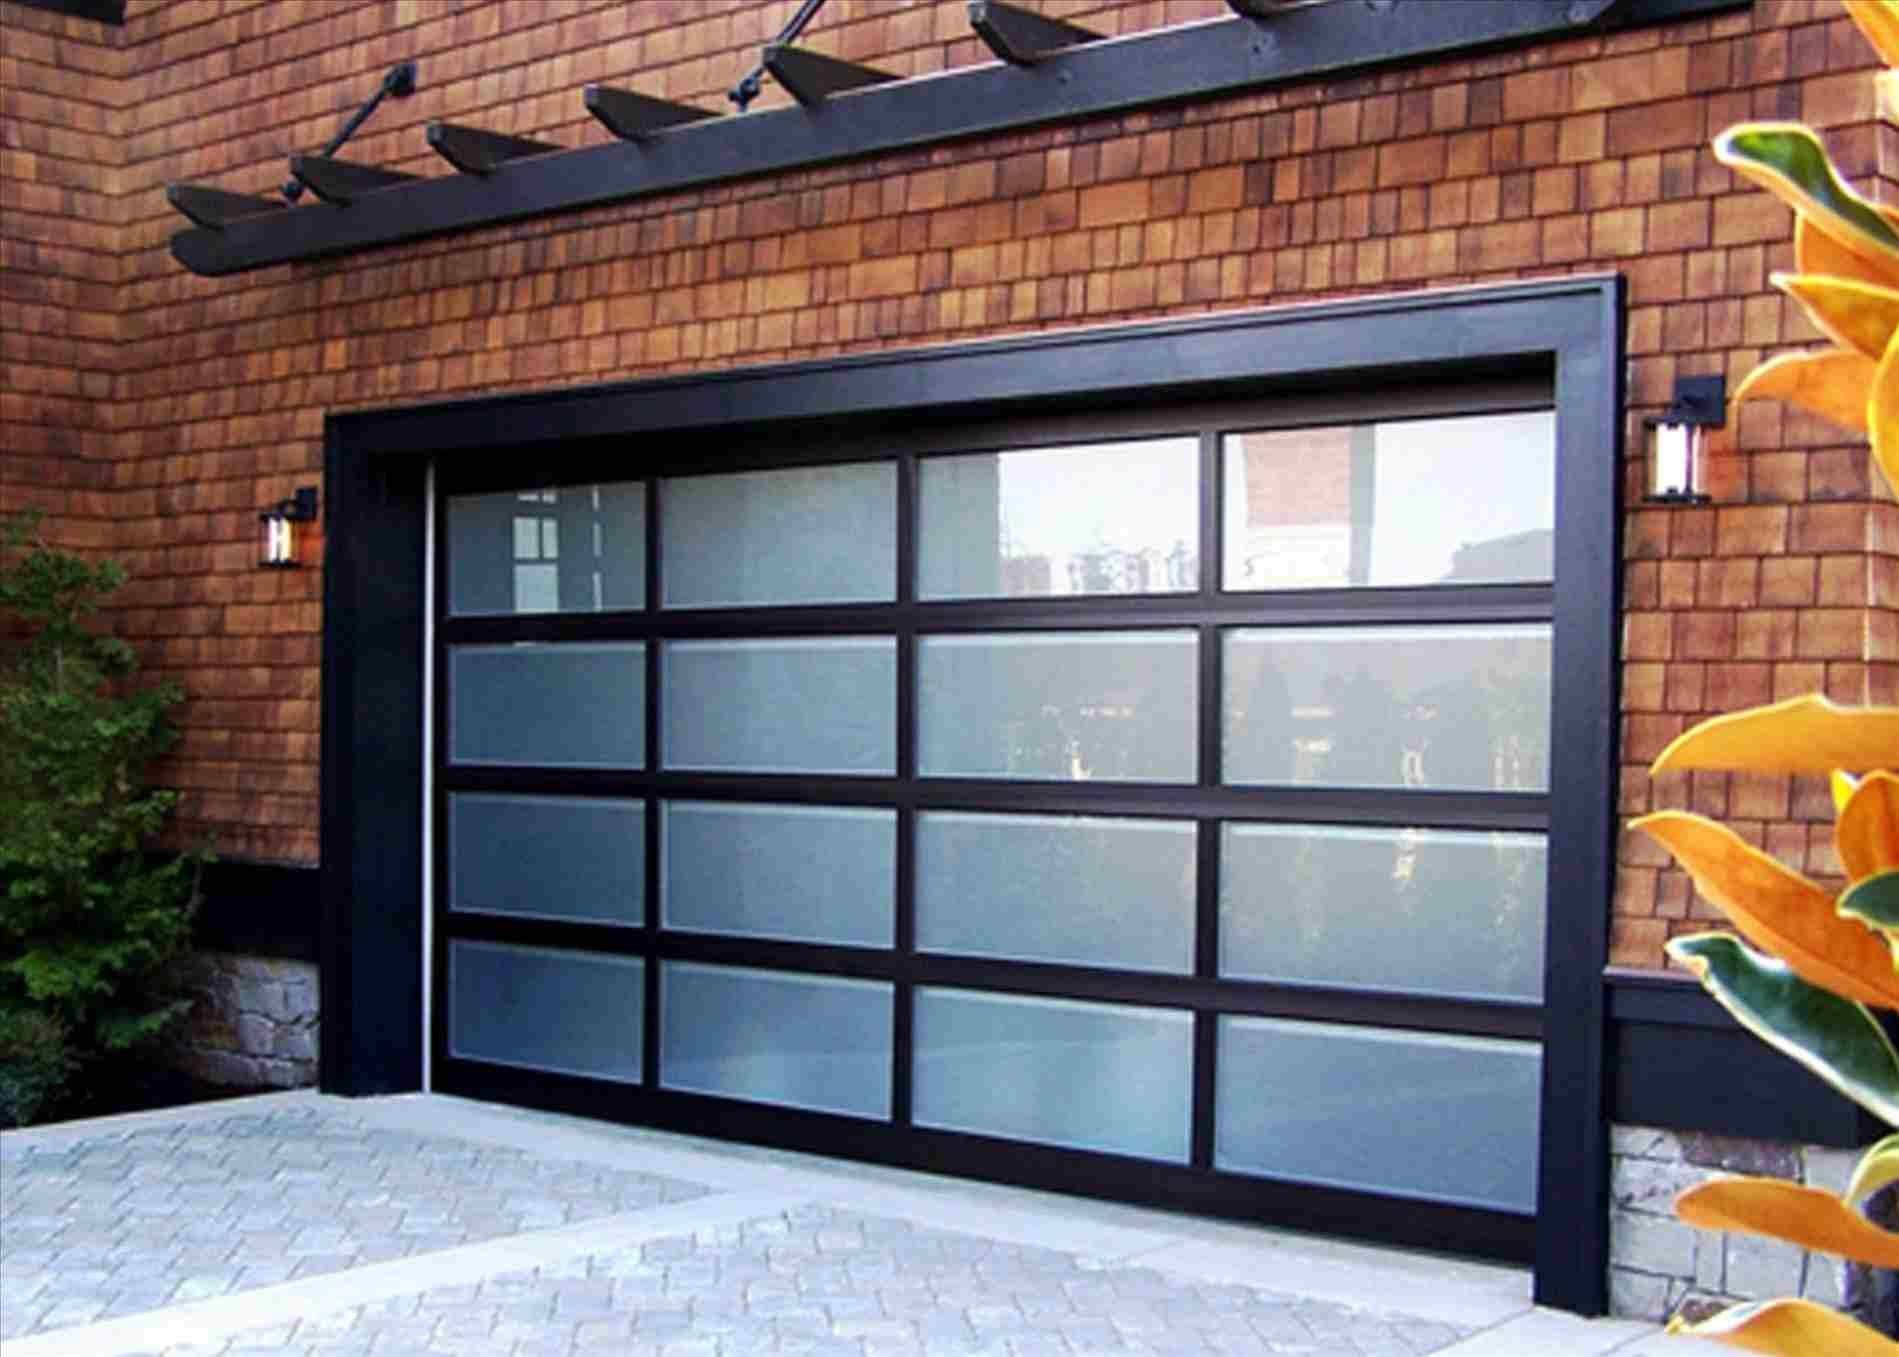 Maryland Garage Door Repair   Full Size Of Door:charming Replacementrs And  Windows In Modern